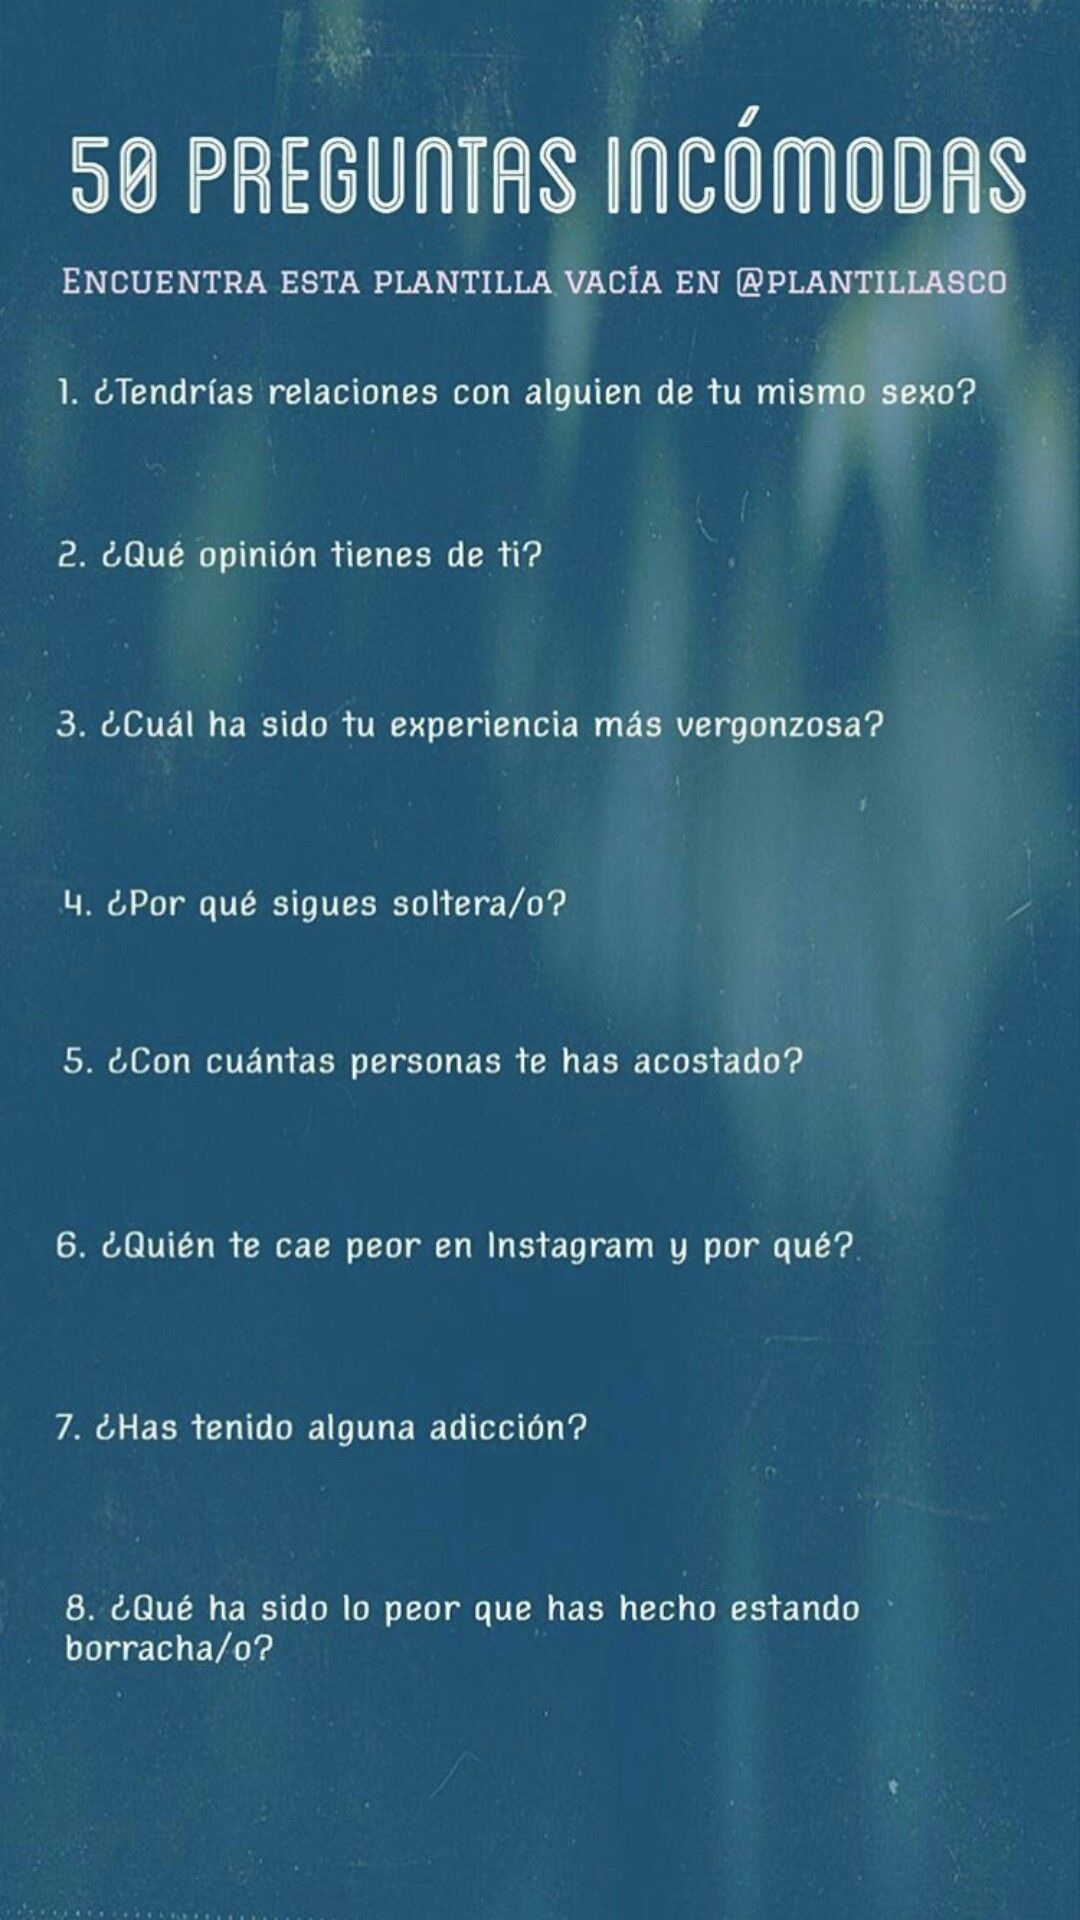 50 Preguntas Incomodas Cosas Cursis This Or That Questions